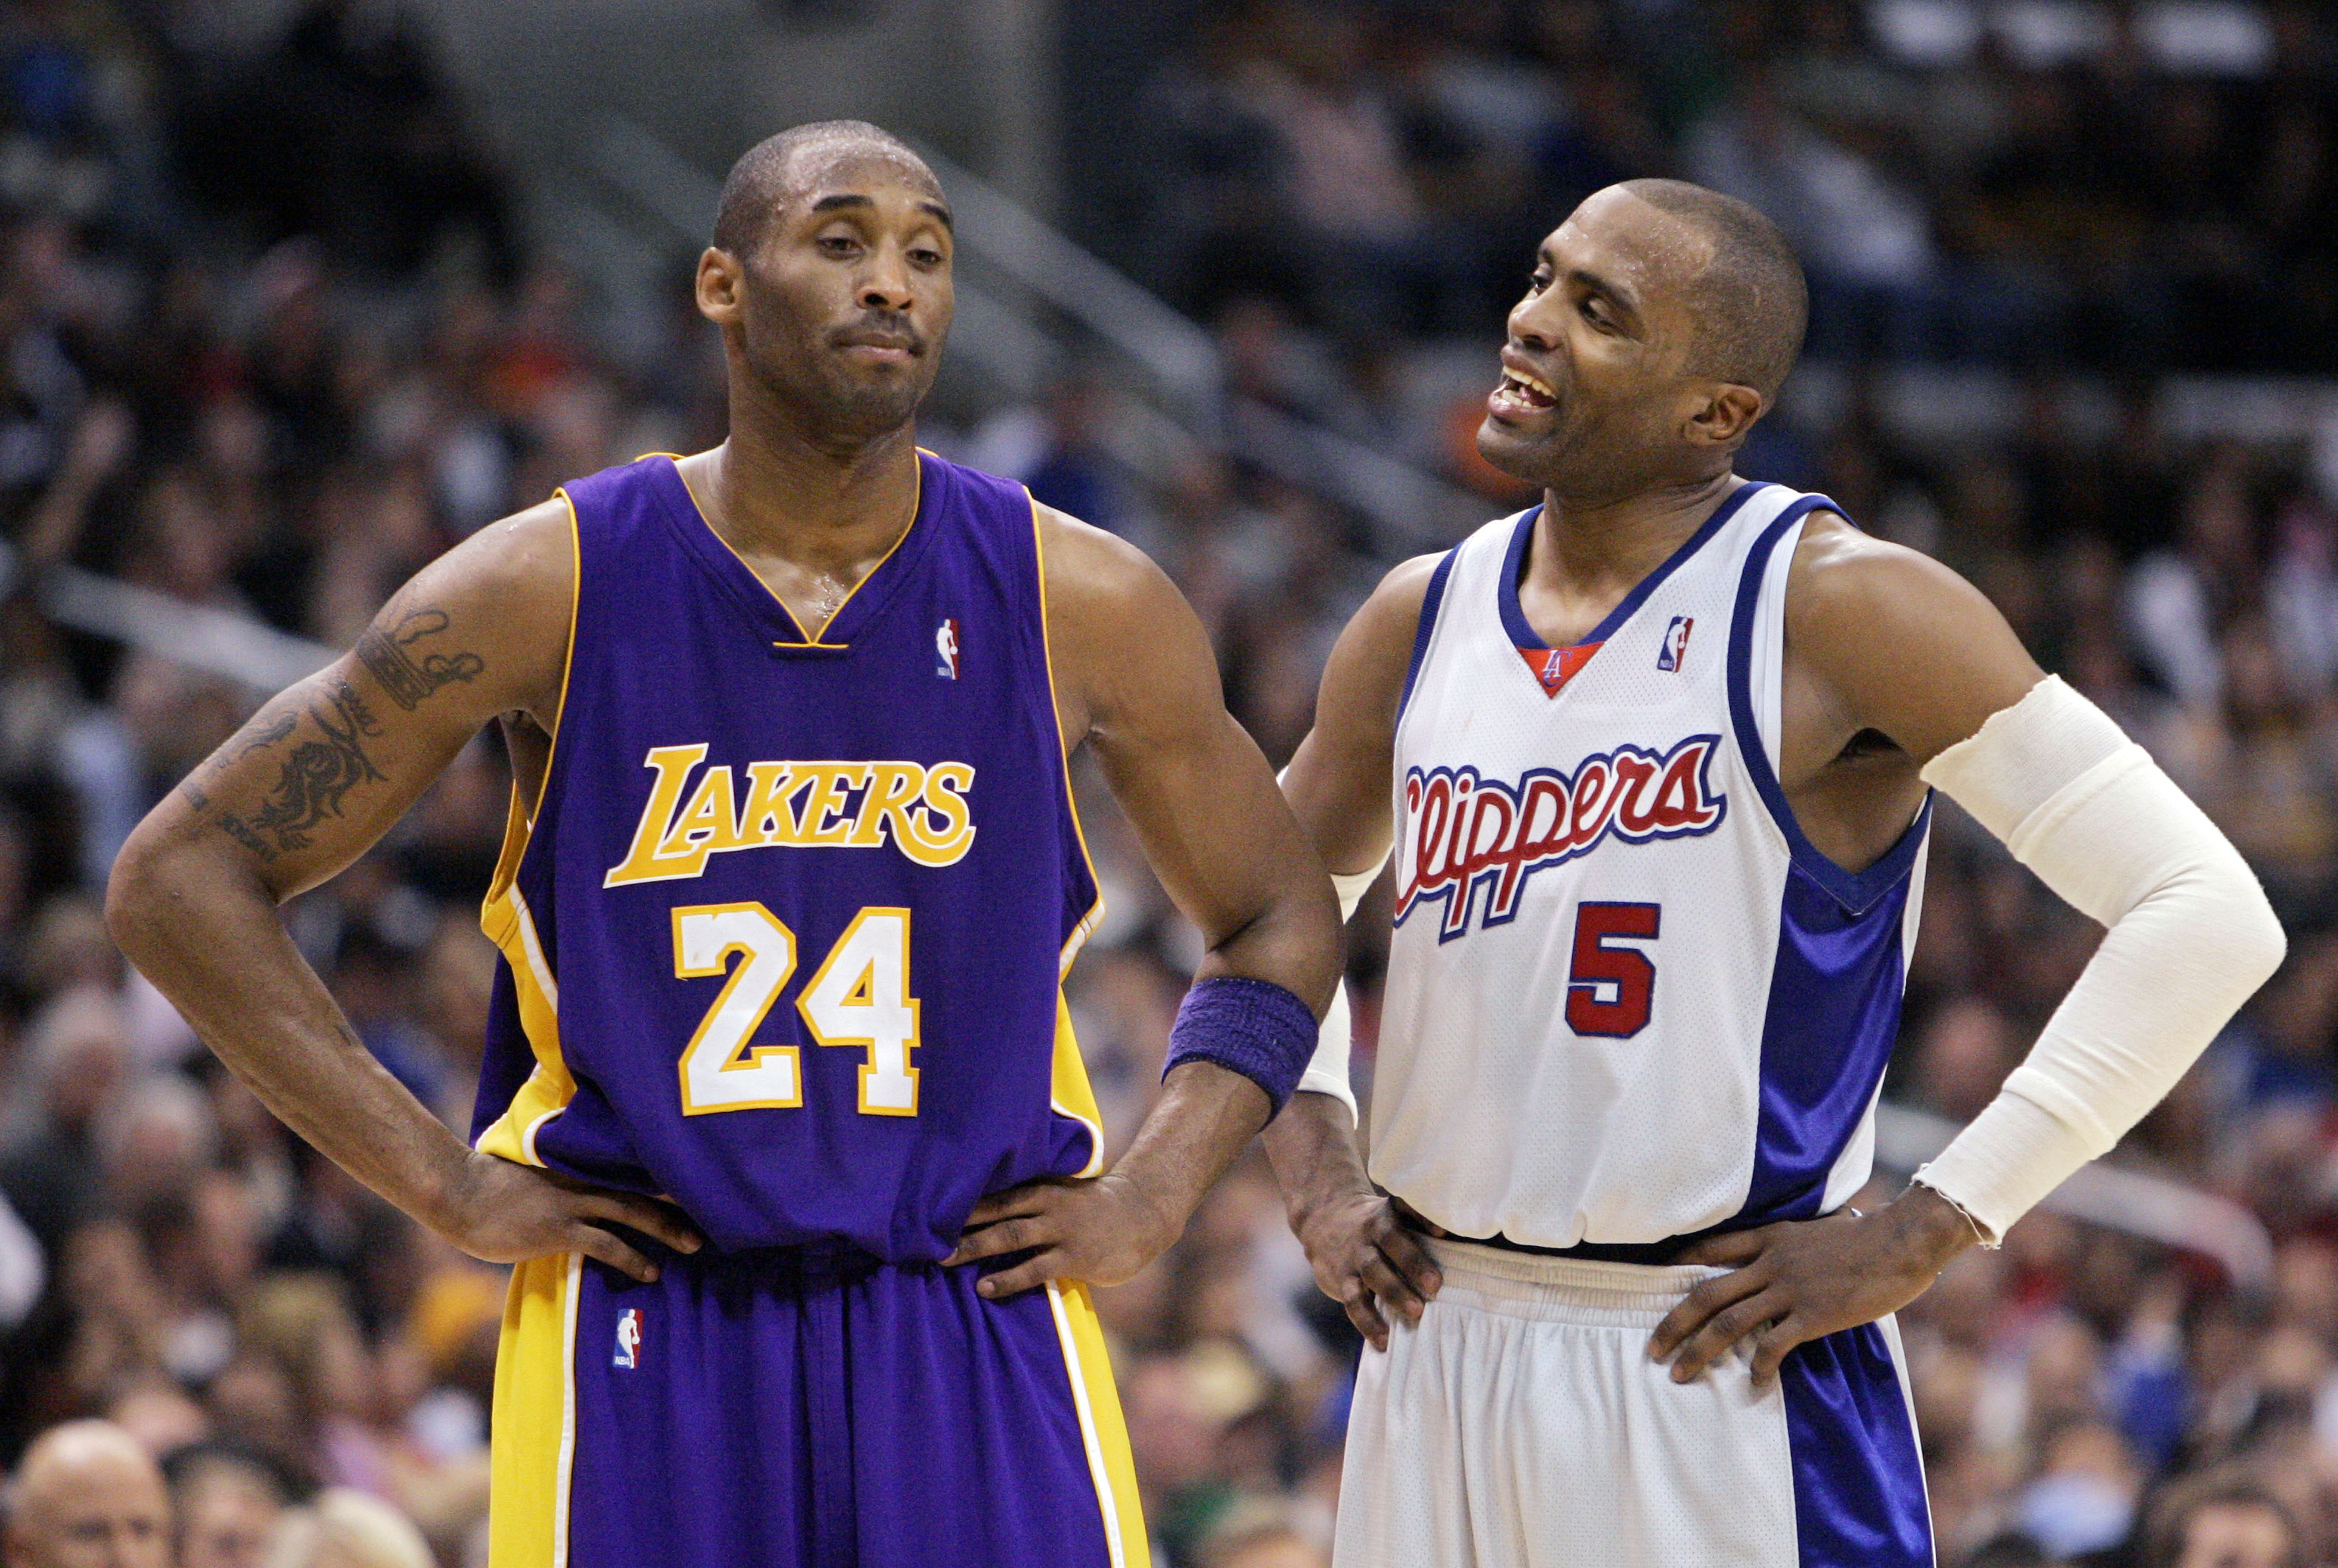 Kobe Bryant and Cuttino Mobley